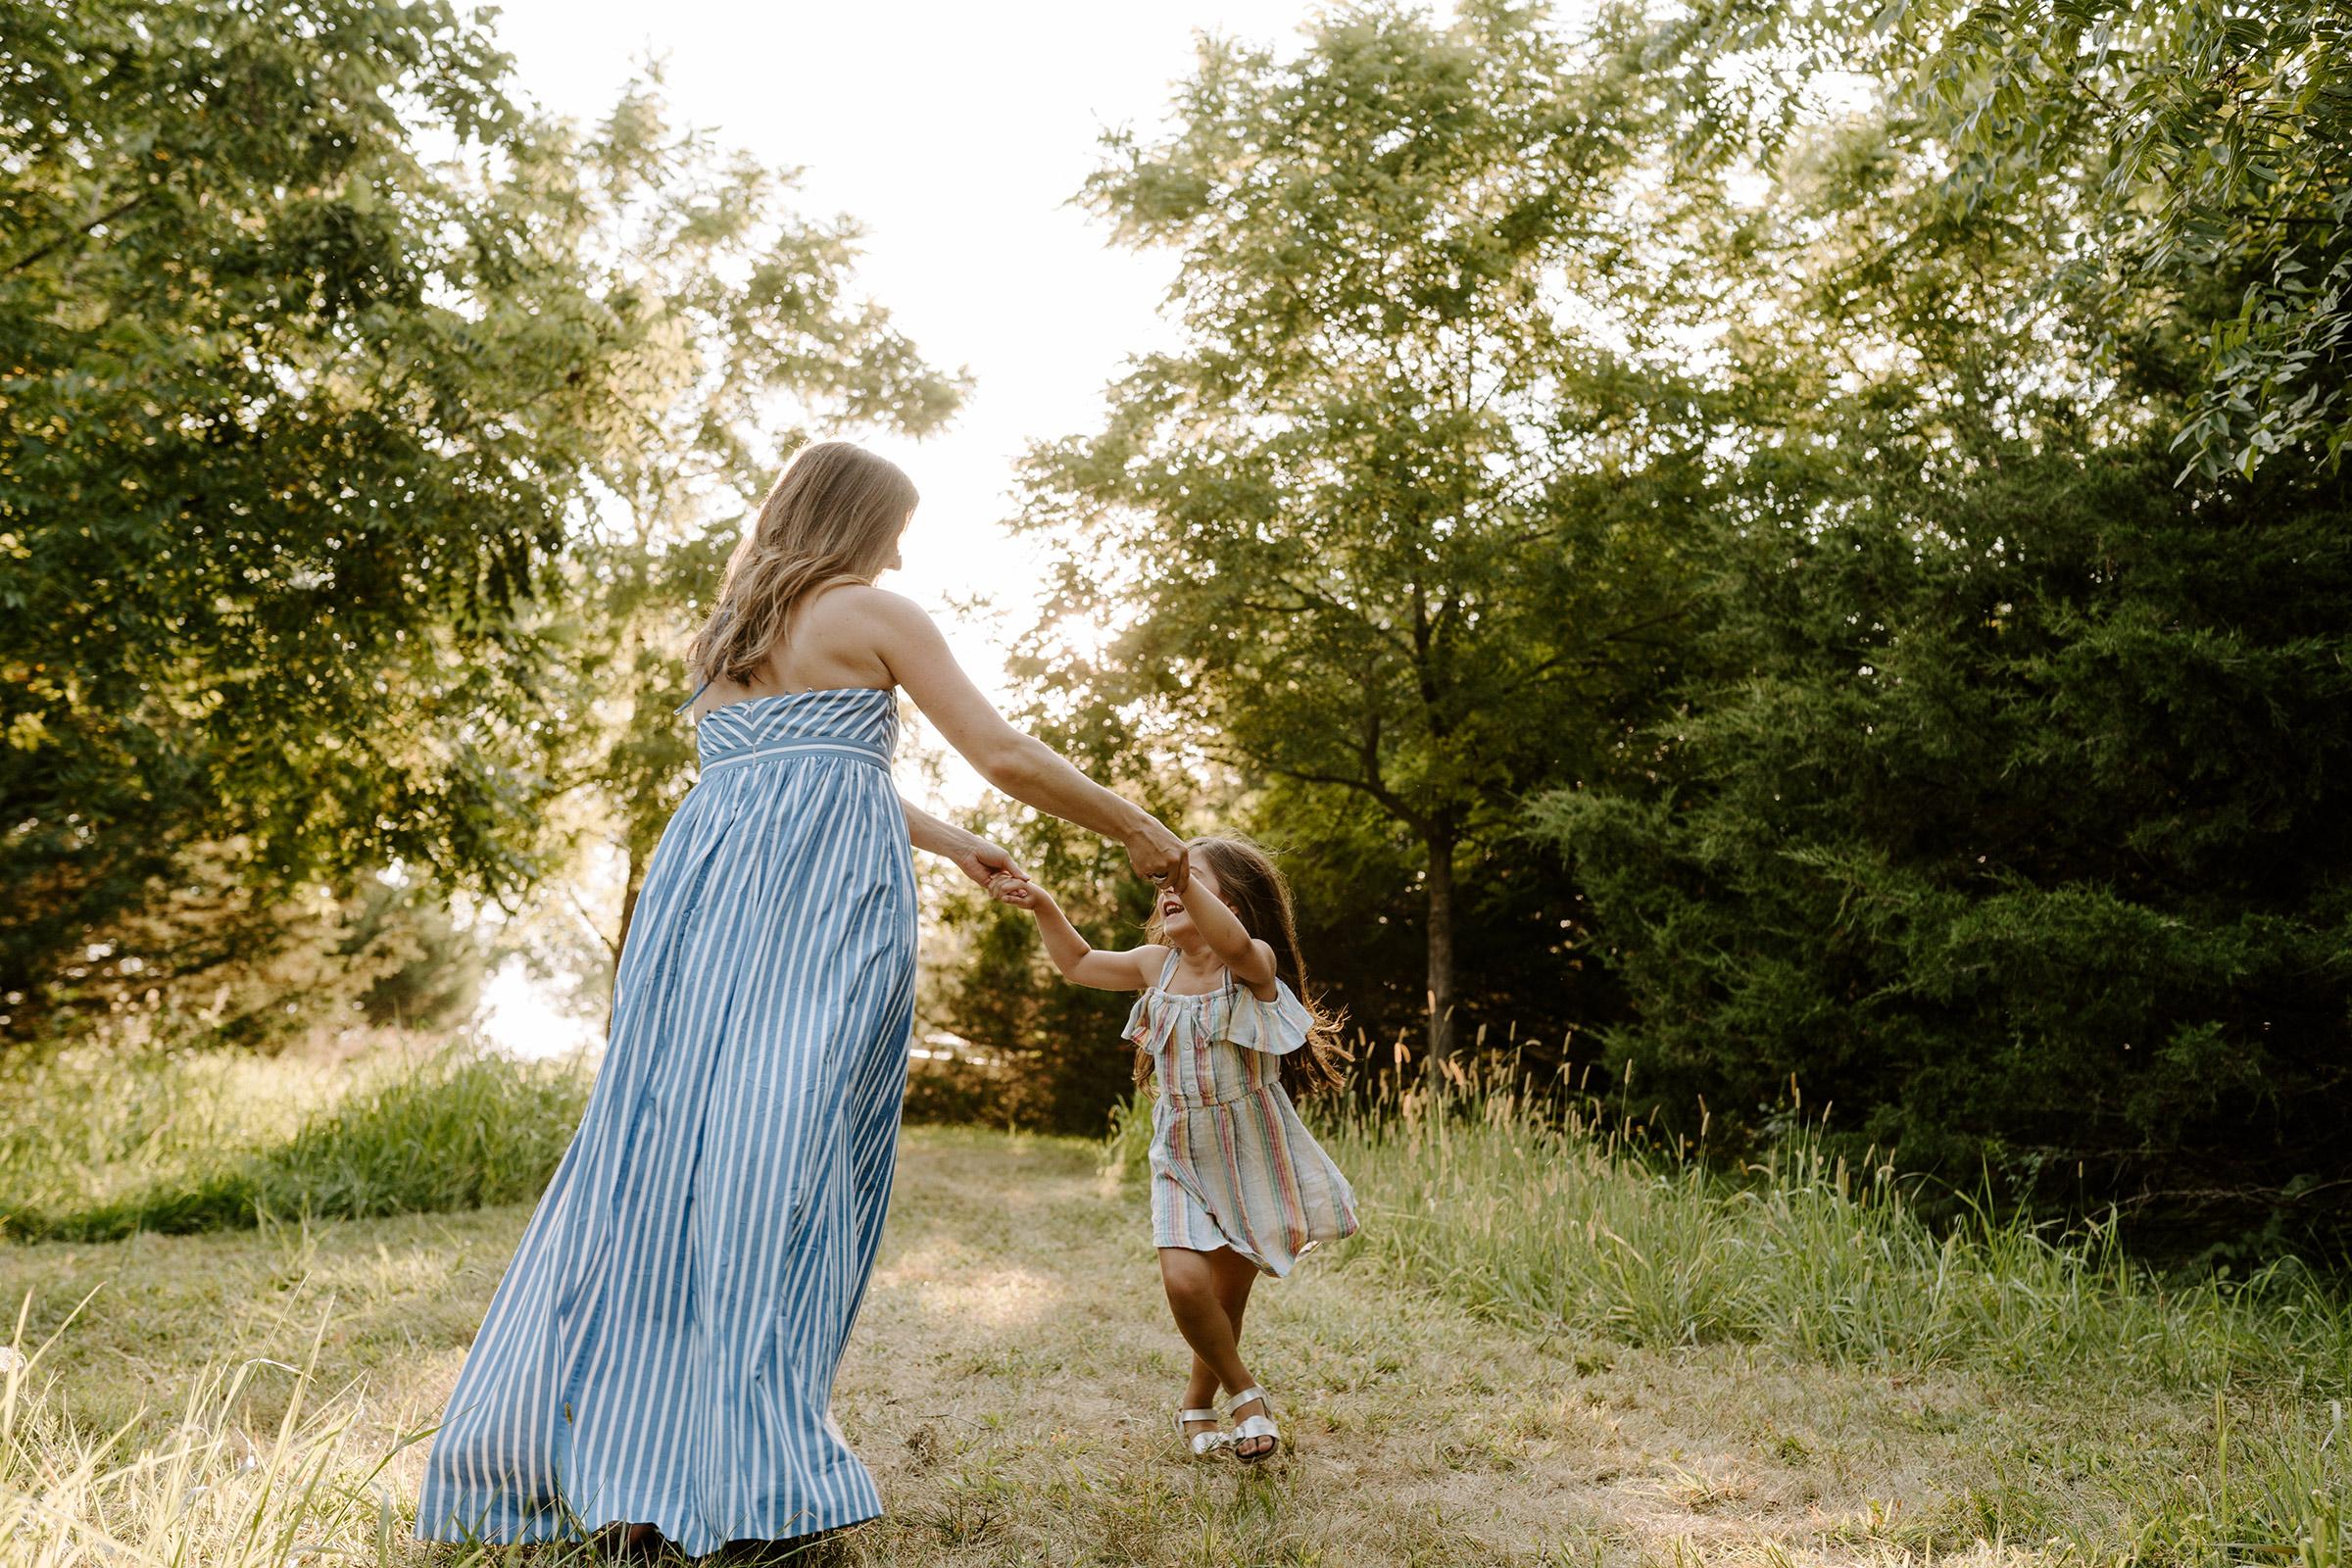 natale-family-mom-spinning-daughter-around-iris-aisle--winterset-iowa-raelyn-ramey-photography-112.jpg